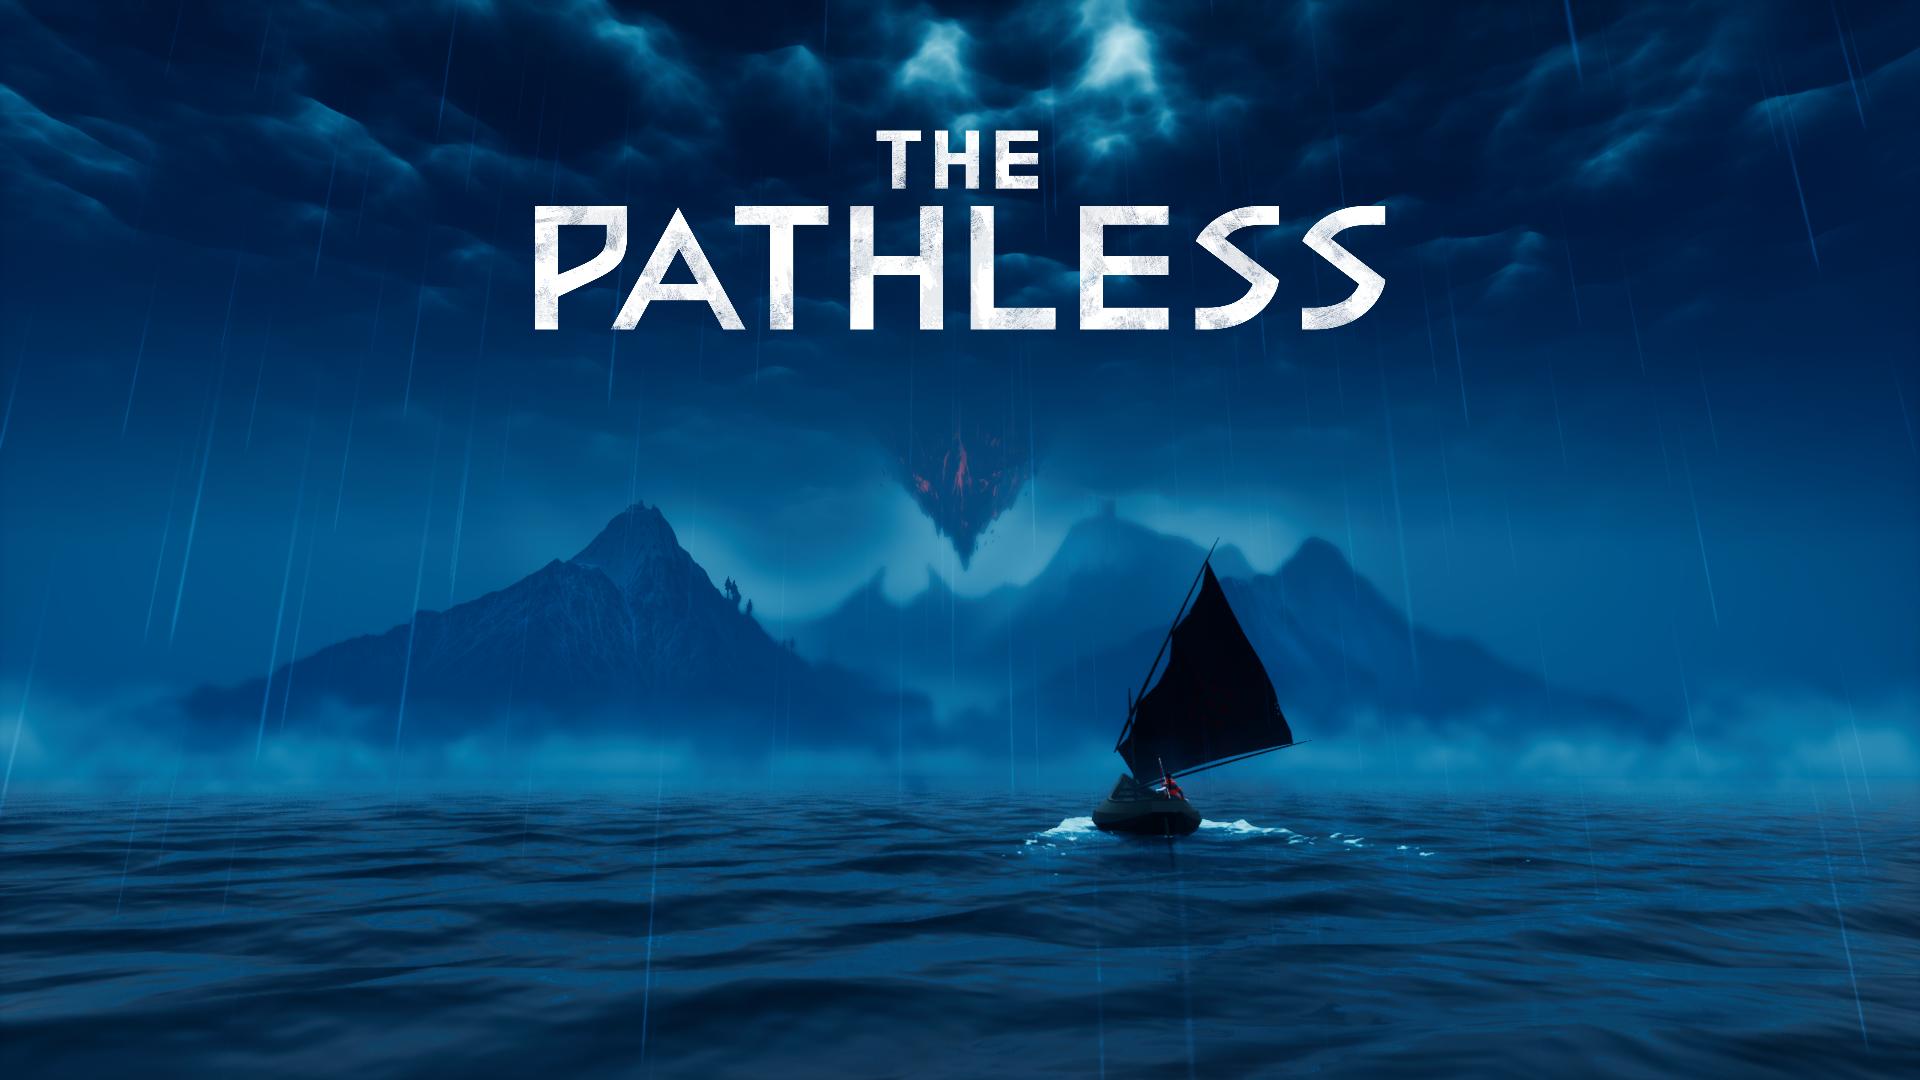 The Pathless Écran départ GeekAnimea